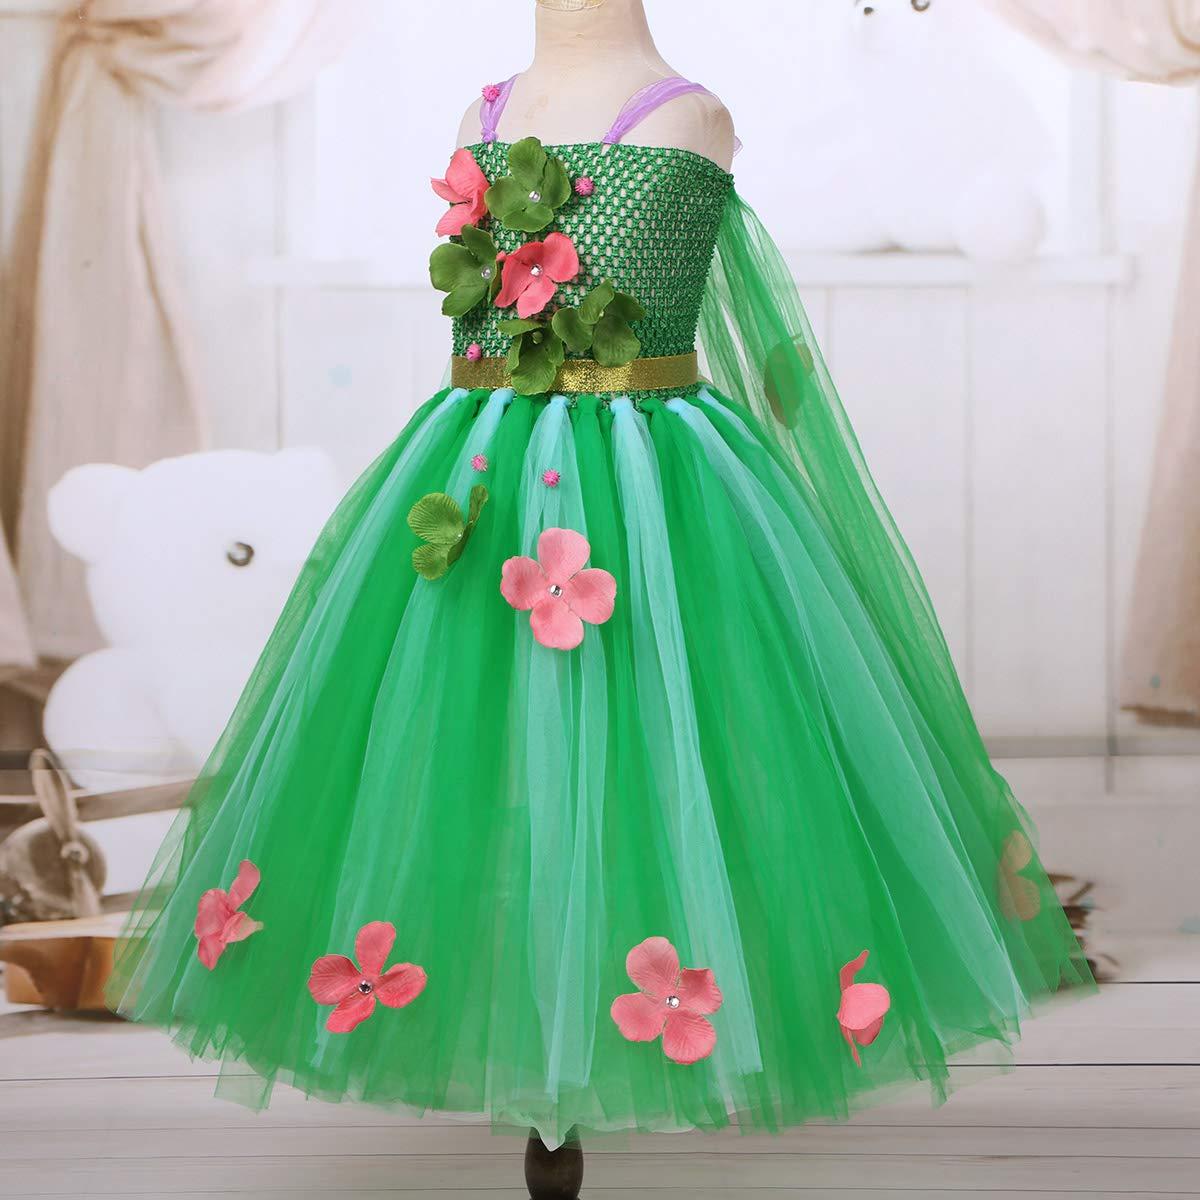 Freebily Vestido Flores Niñas Disfraces De Princesa Reina